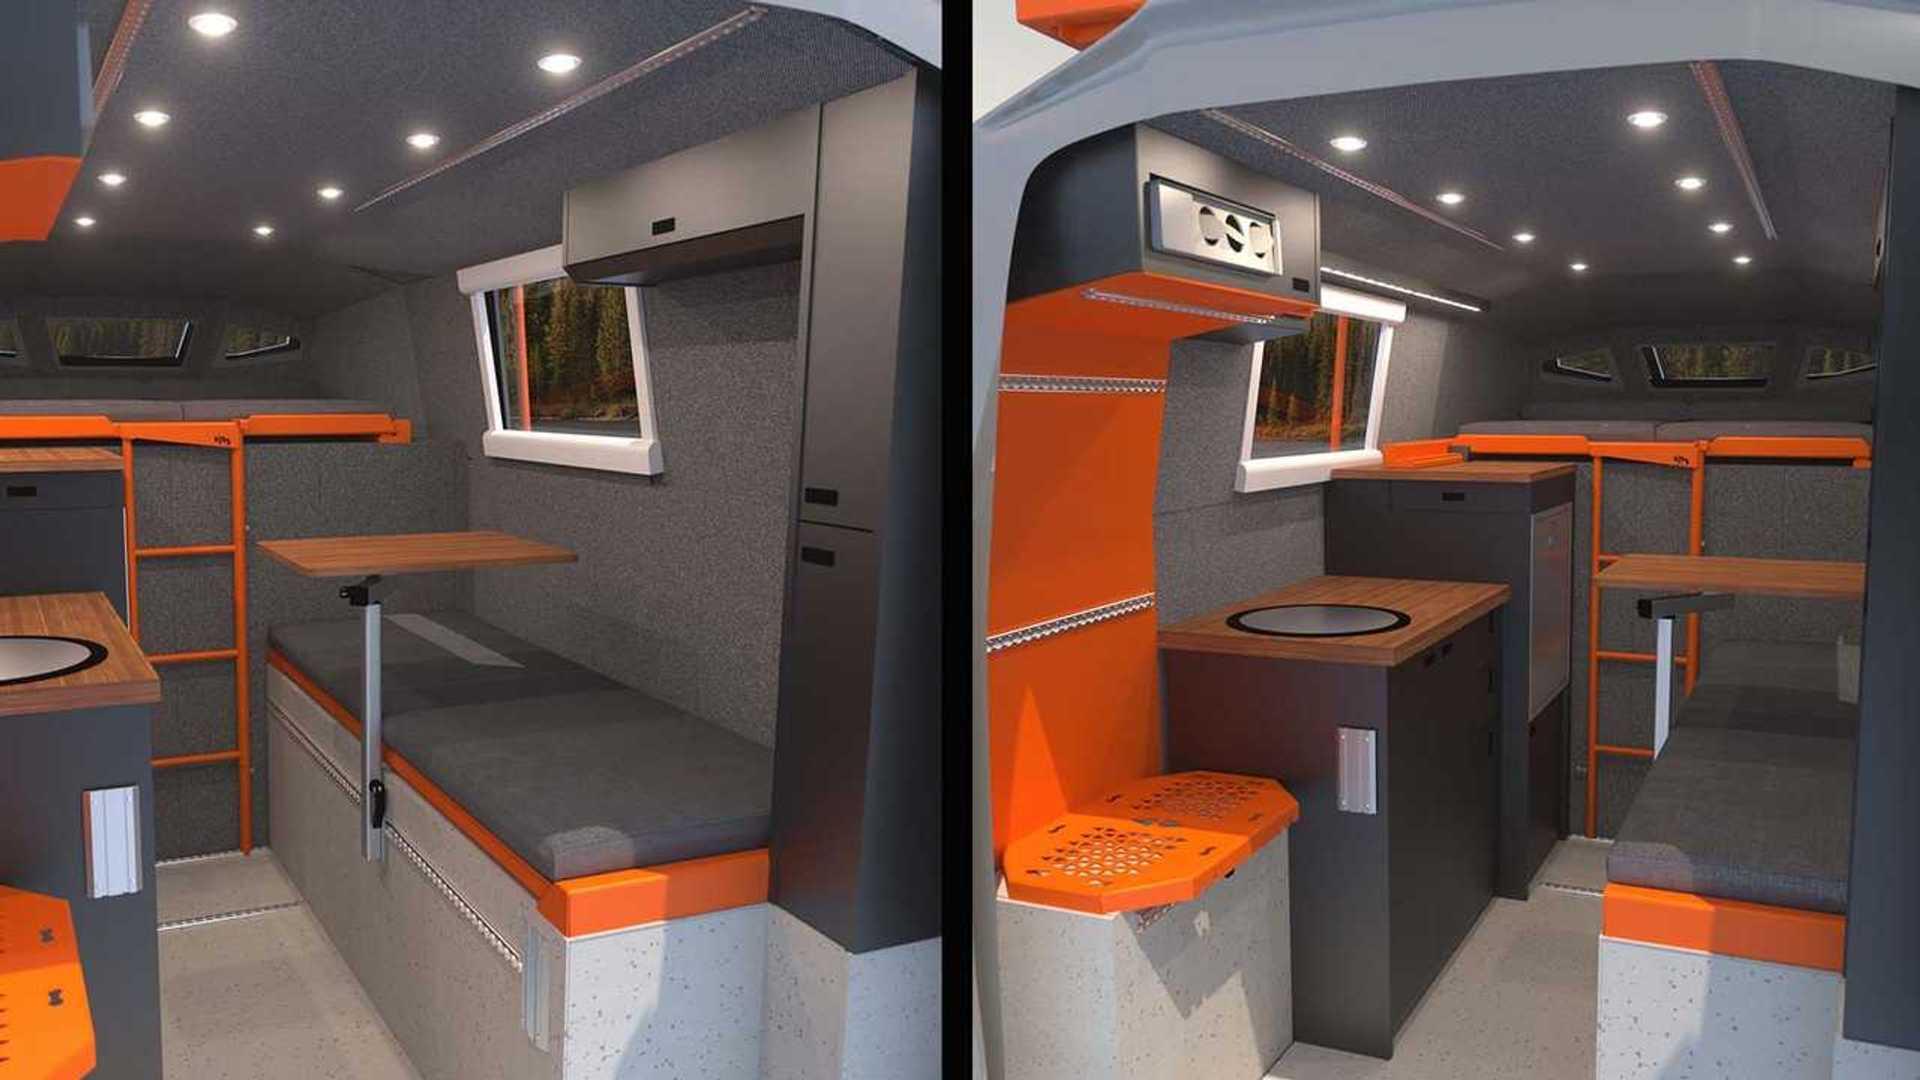 loki icarus truck camper interior rendering.